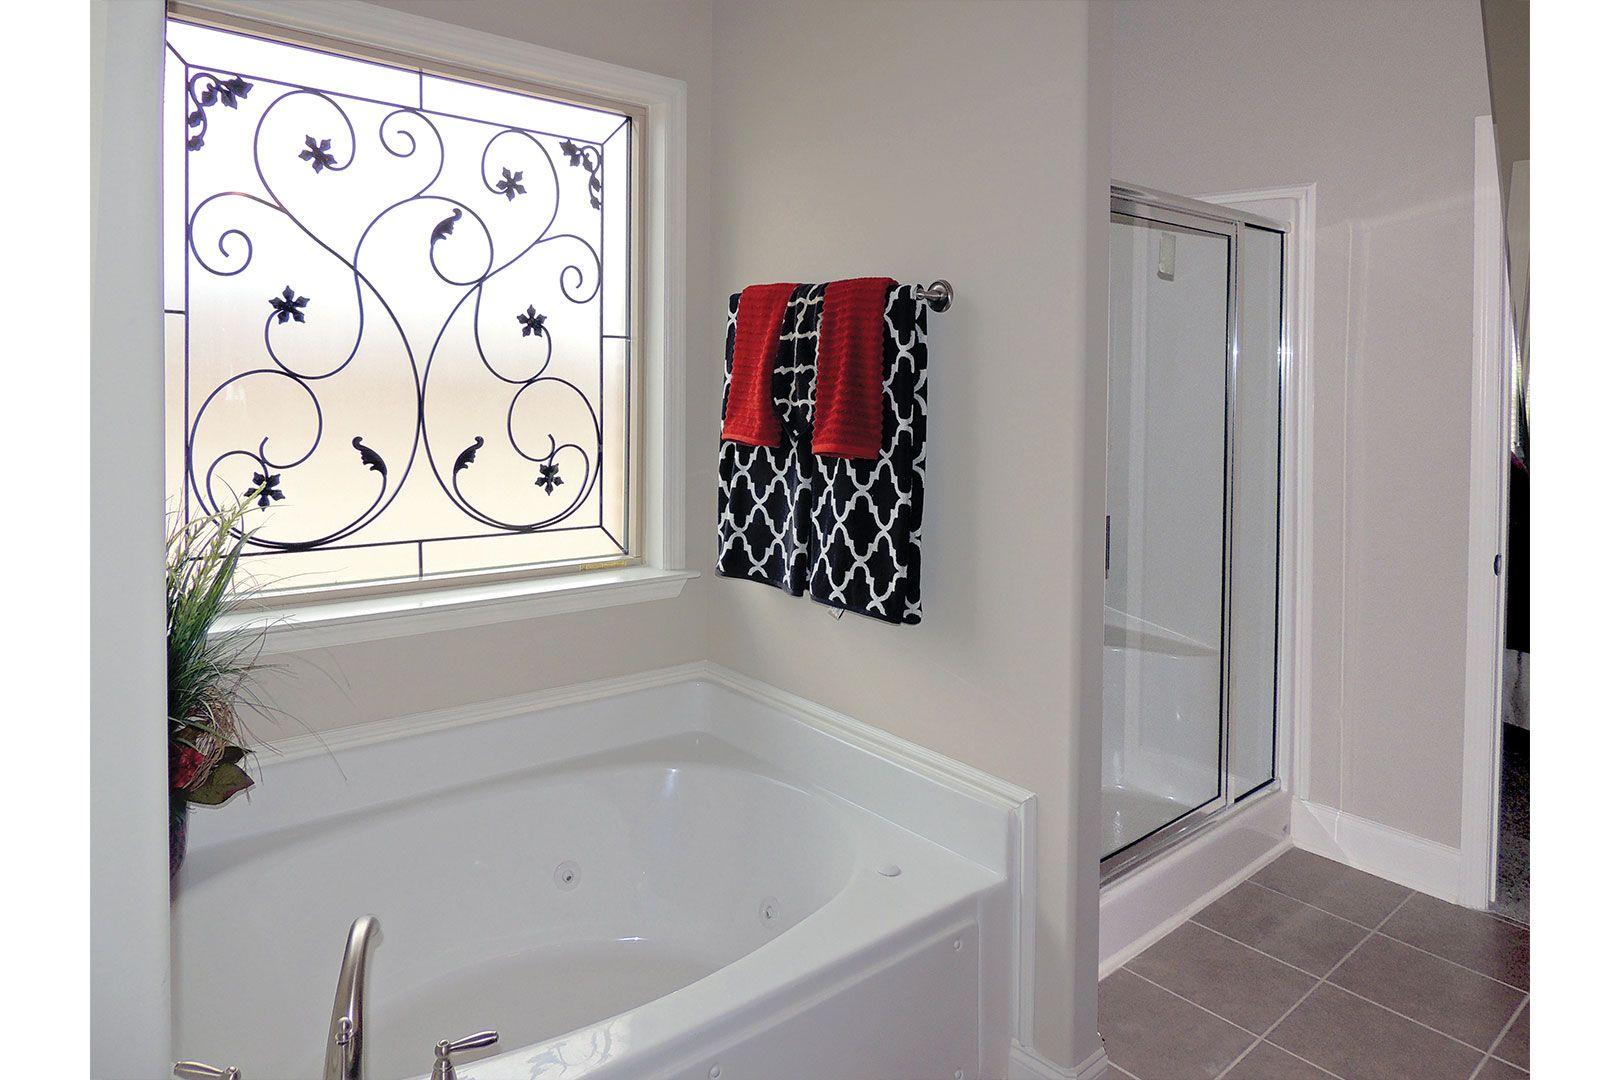 Hy Lite Decorative Glass Privacy Window In Master Bath. Wrought Iron  Brilliance Design With